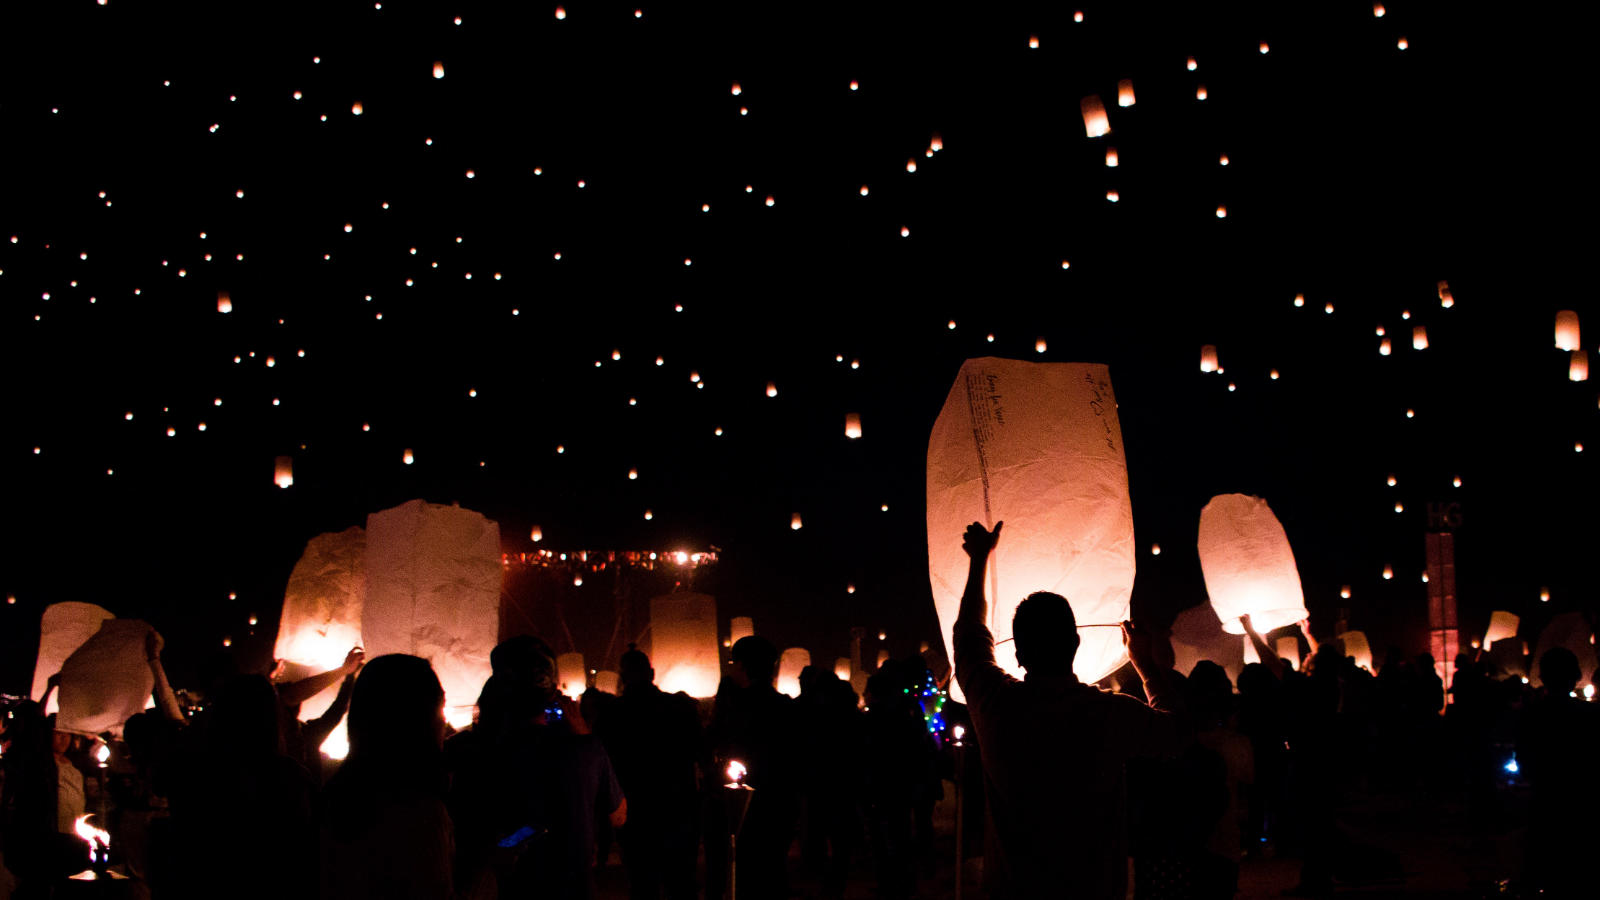 Lanterns and stars